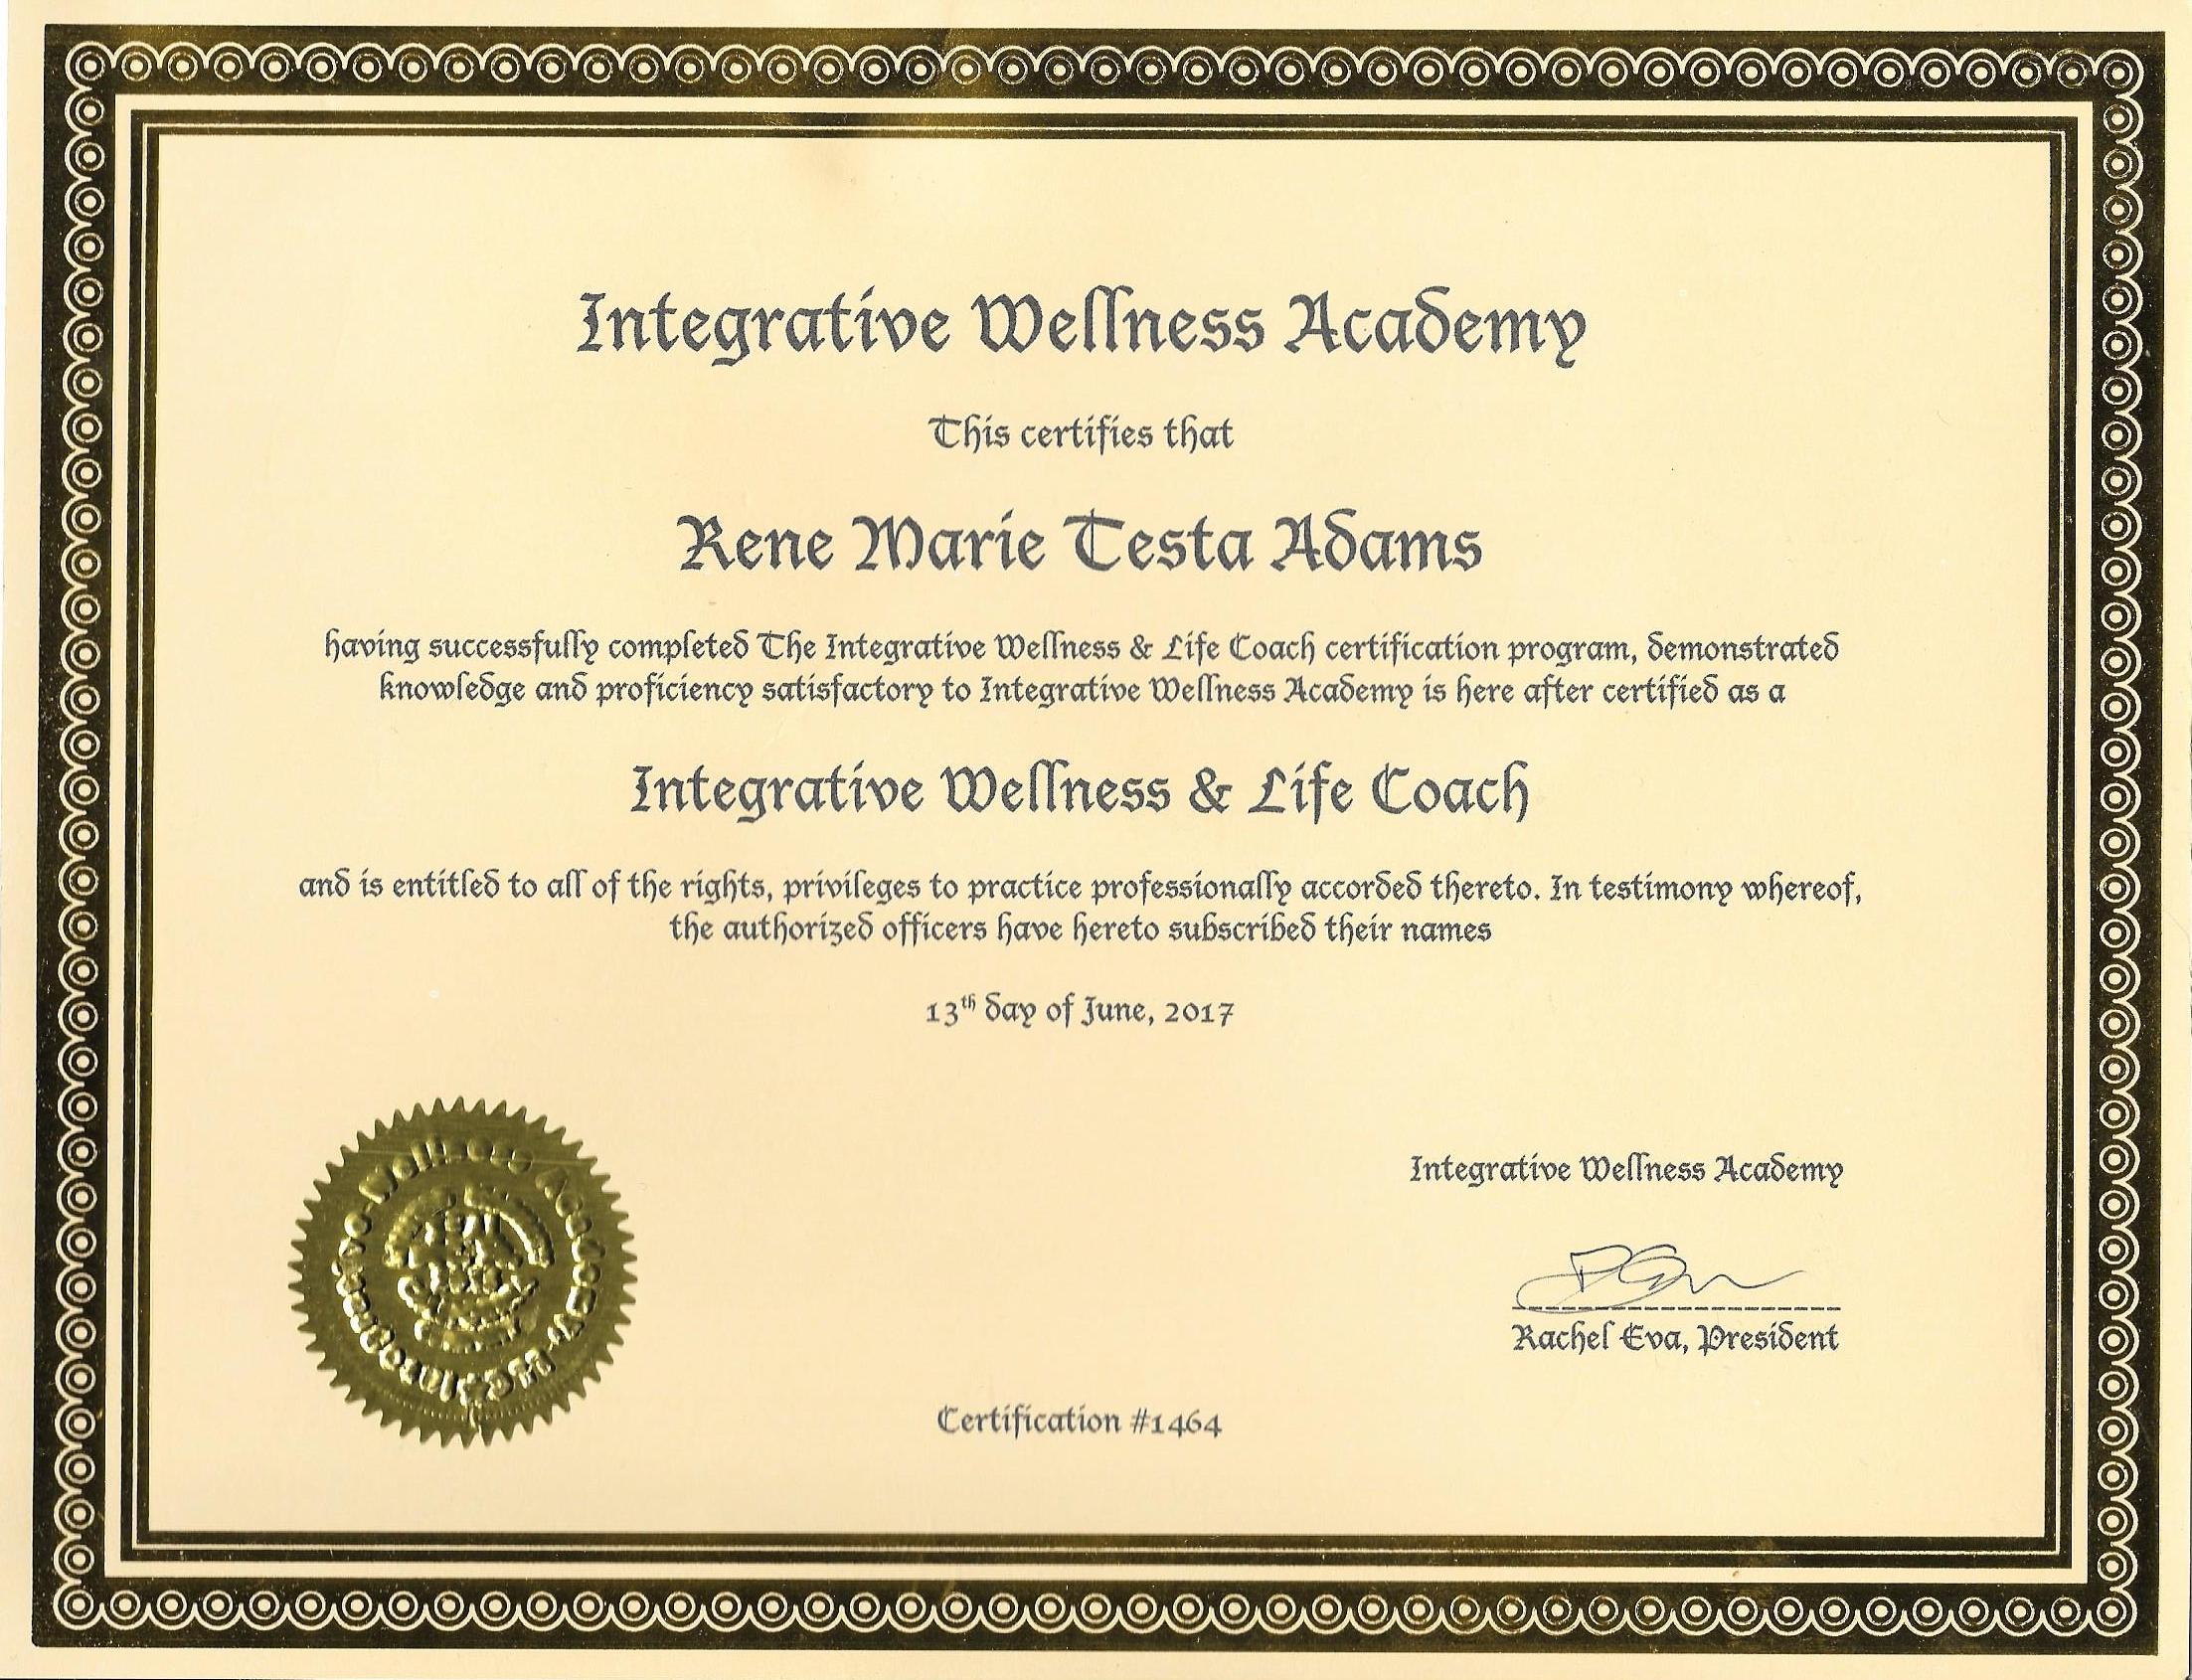 Integrative Wellness Academy